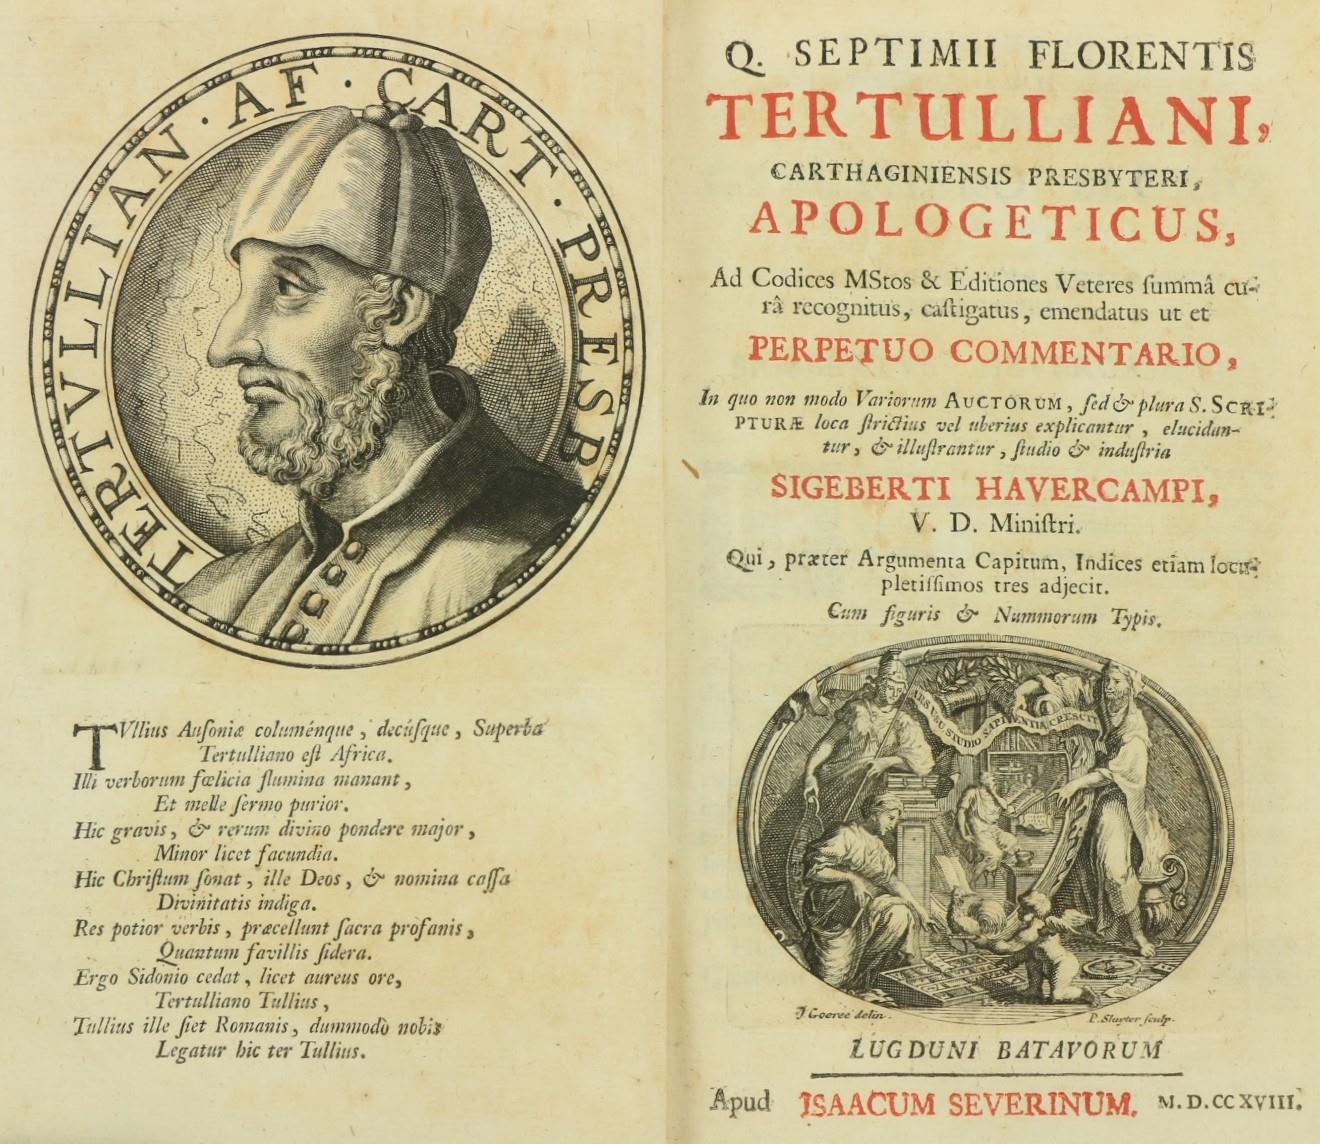 Armorial Bindings:ÿ Havercampi (Sigeberti)Ed.ÿÿQ. Septimii Florentis Tertulliani, Carthaginiensis - Image 3 of 3